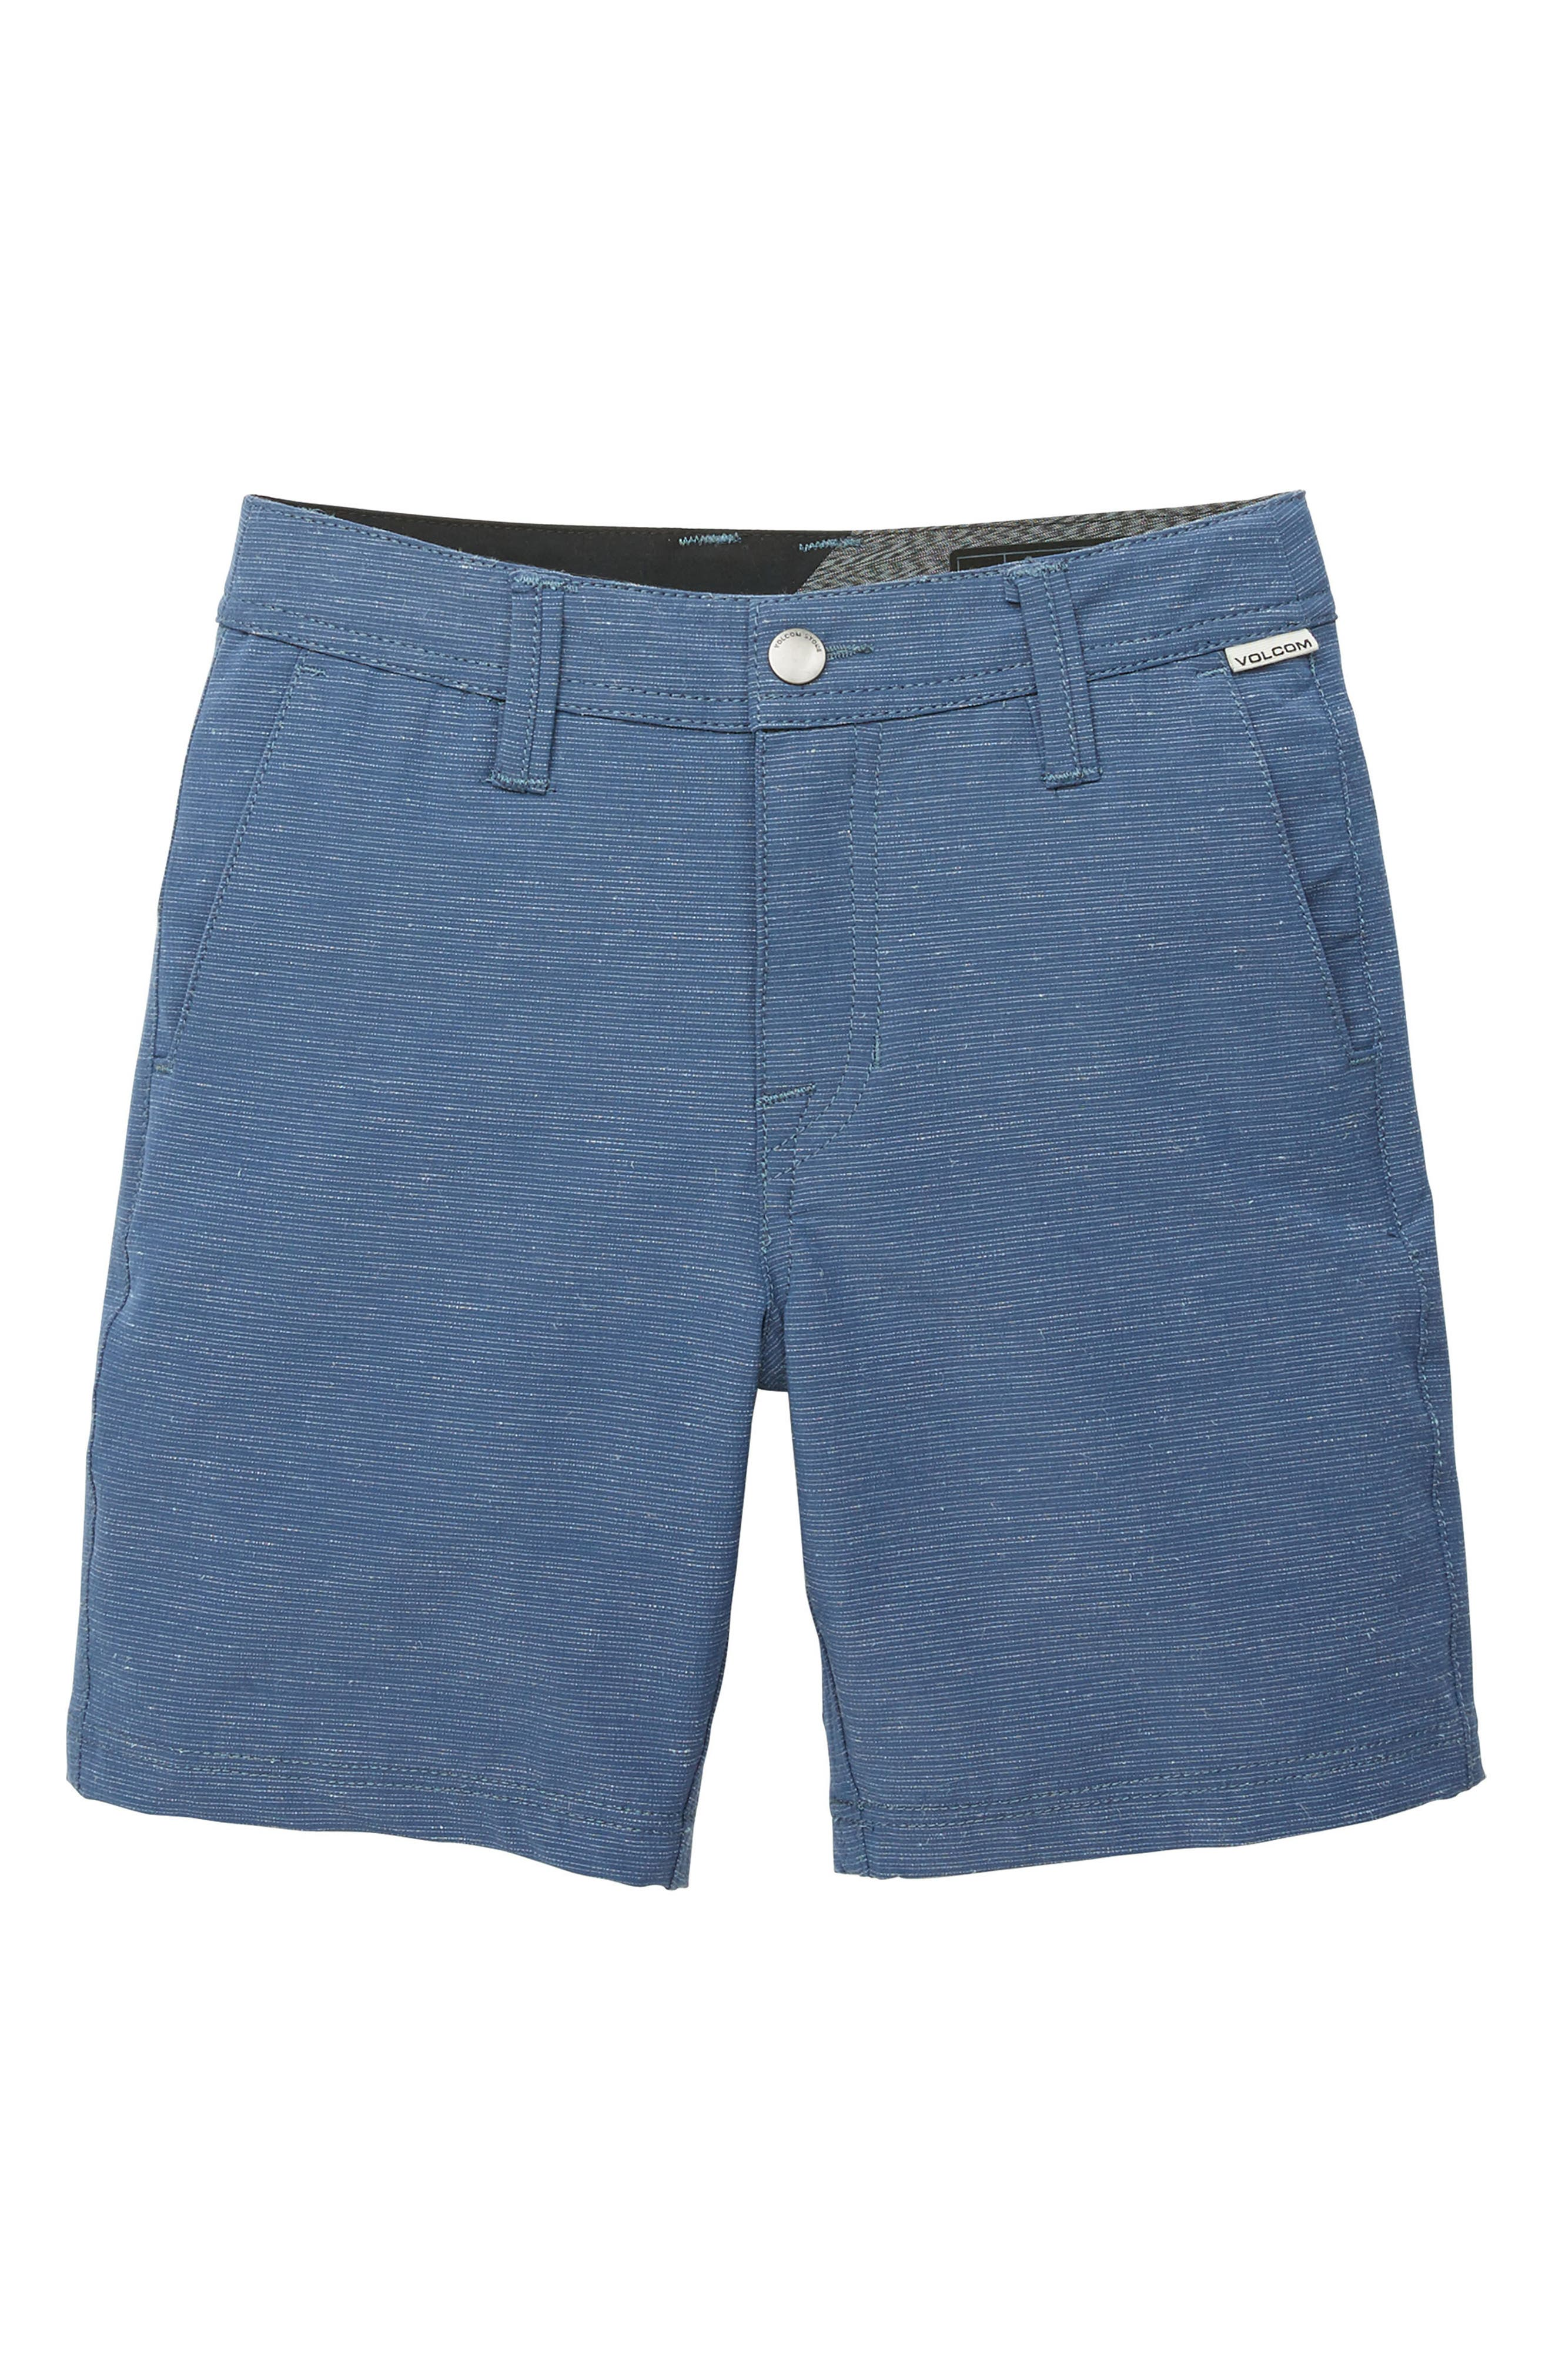 Surf N' Turf Slub Hybrid Shorts,                             Main thumbnail 1, color,                             DEEP WATER